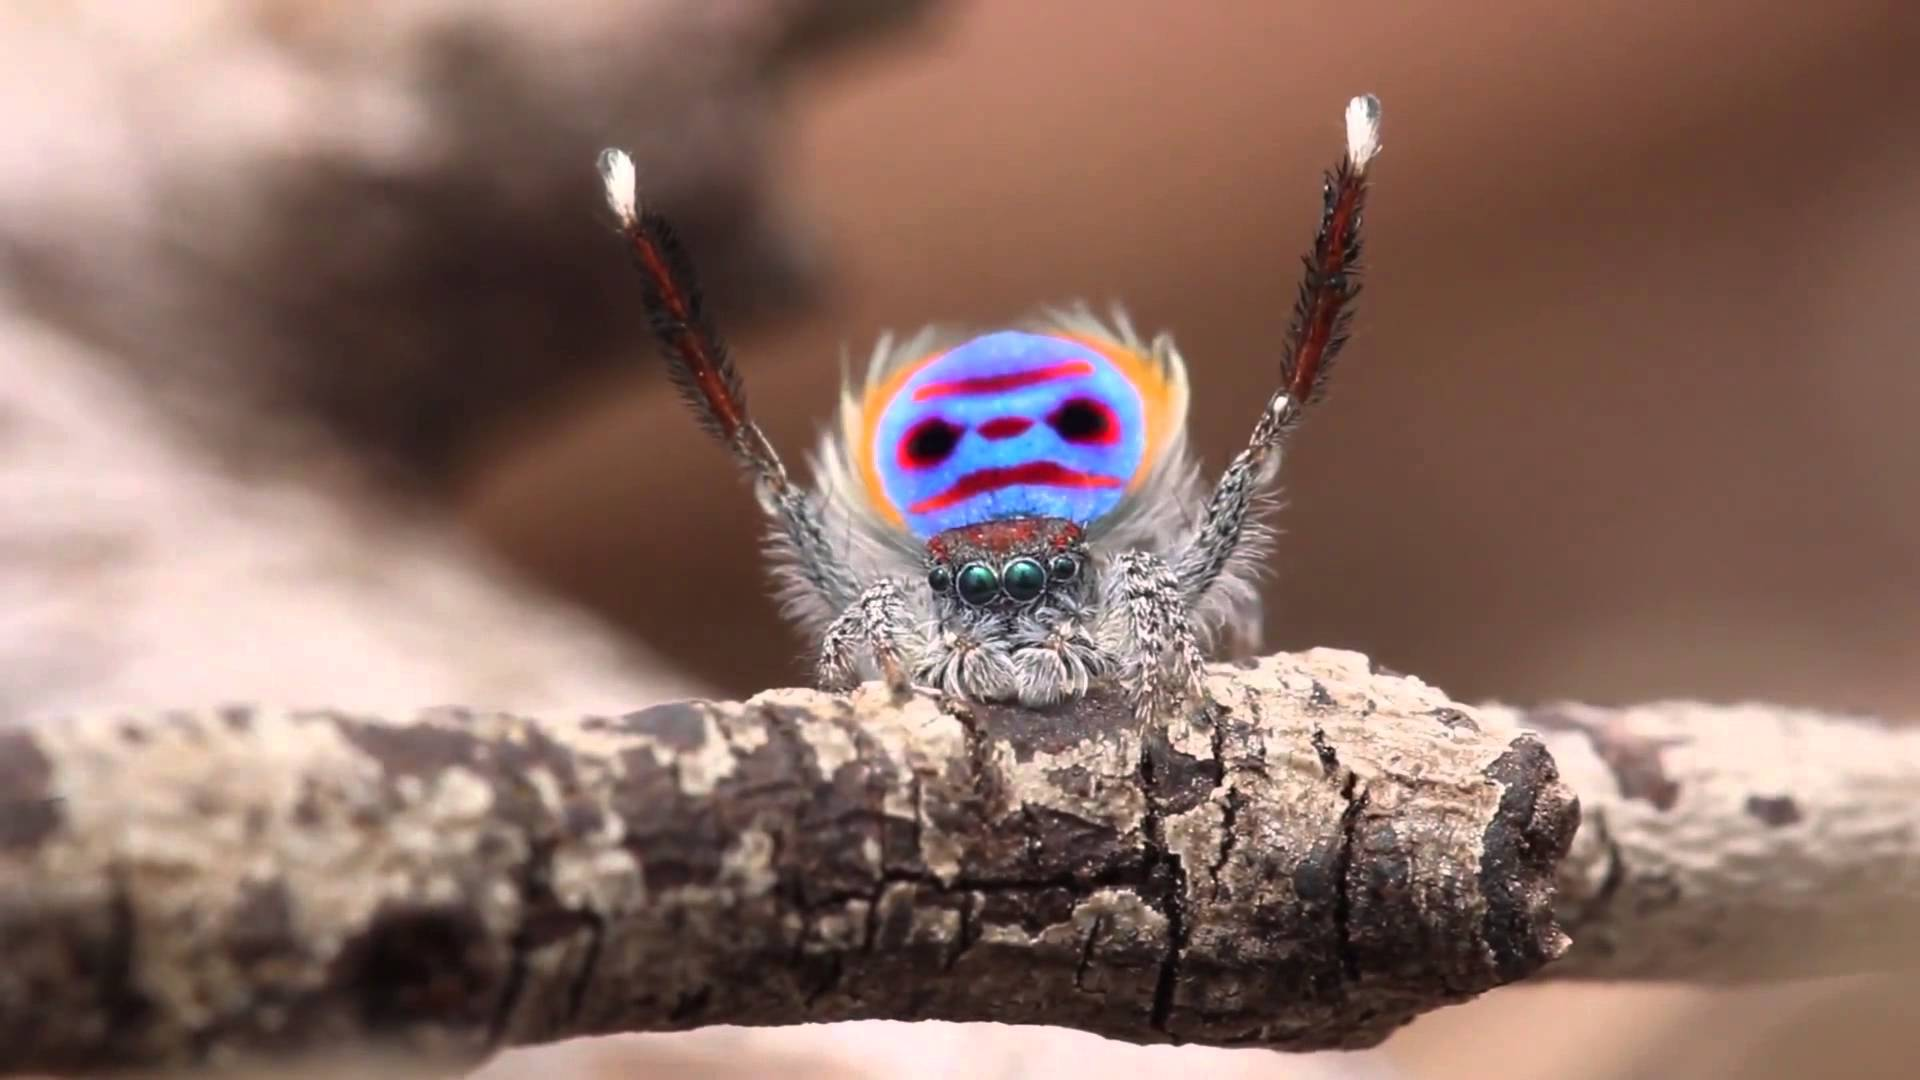 Peacock spider dance - photo#3